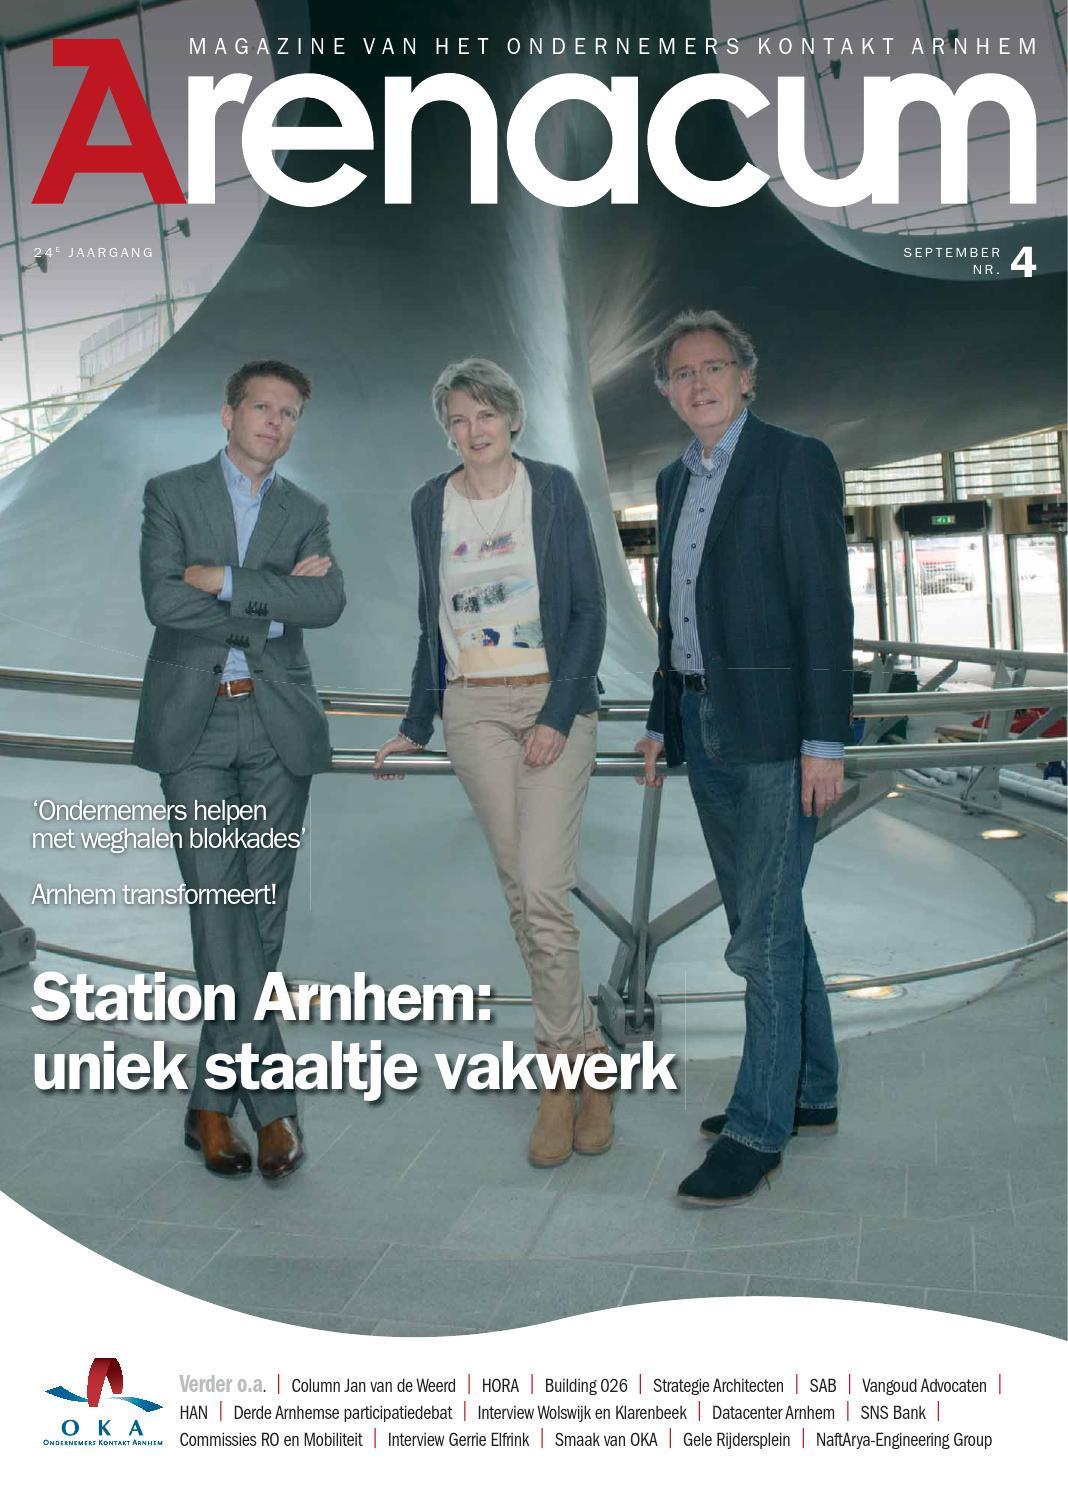 Almere in ontwikkeling by zeeman reclamegroep bv   issuu